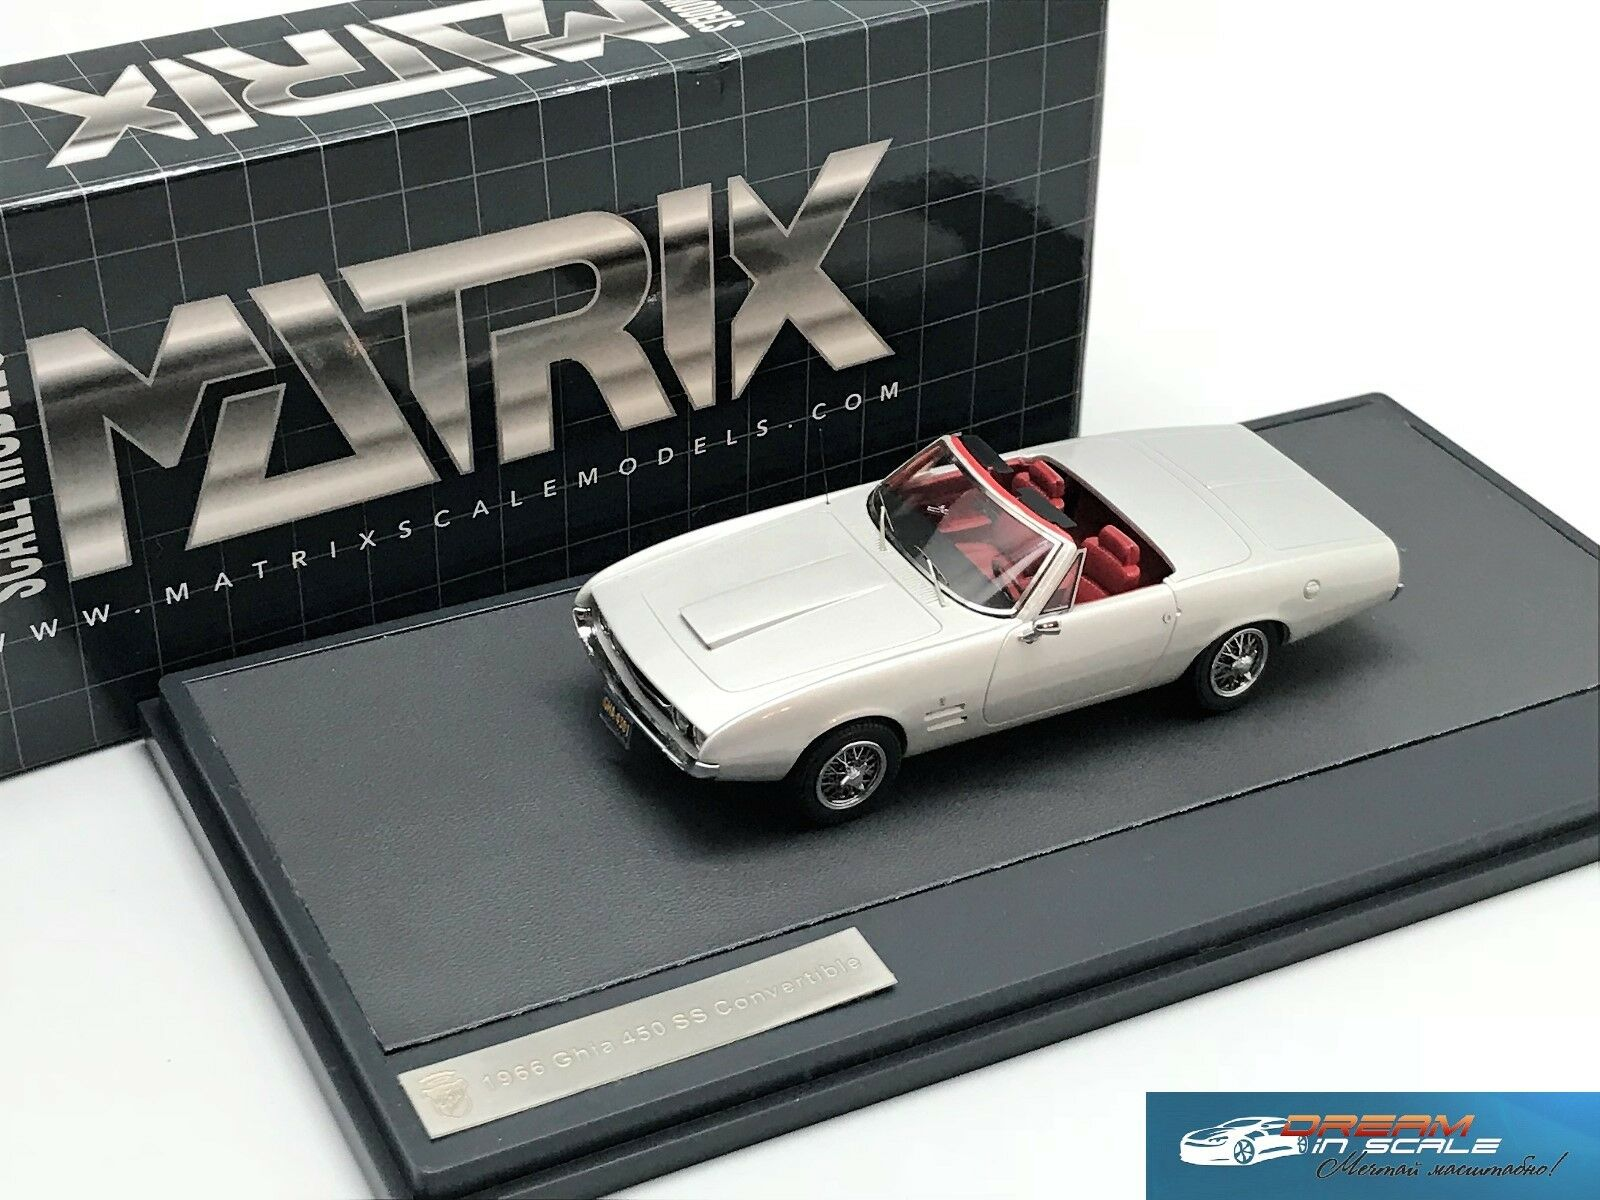 Matriz Ghia 450 Ss Converdeible 1966 MX10701-031 1 43